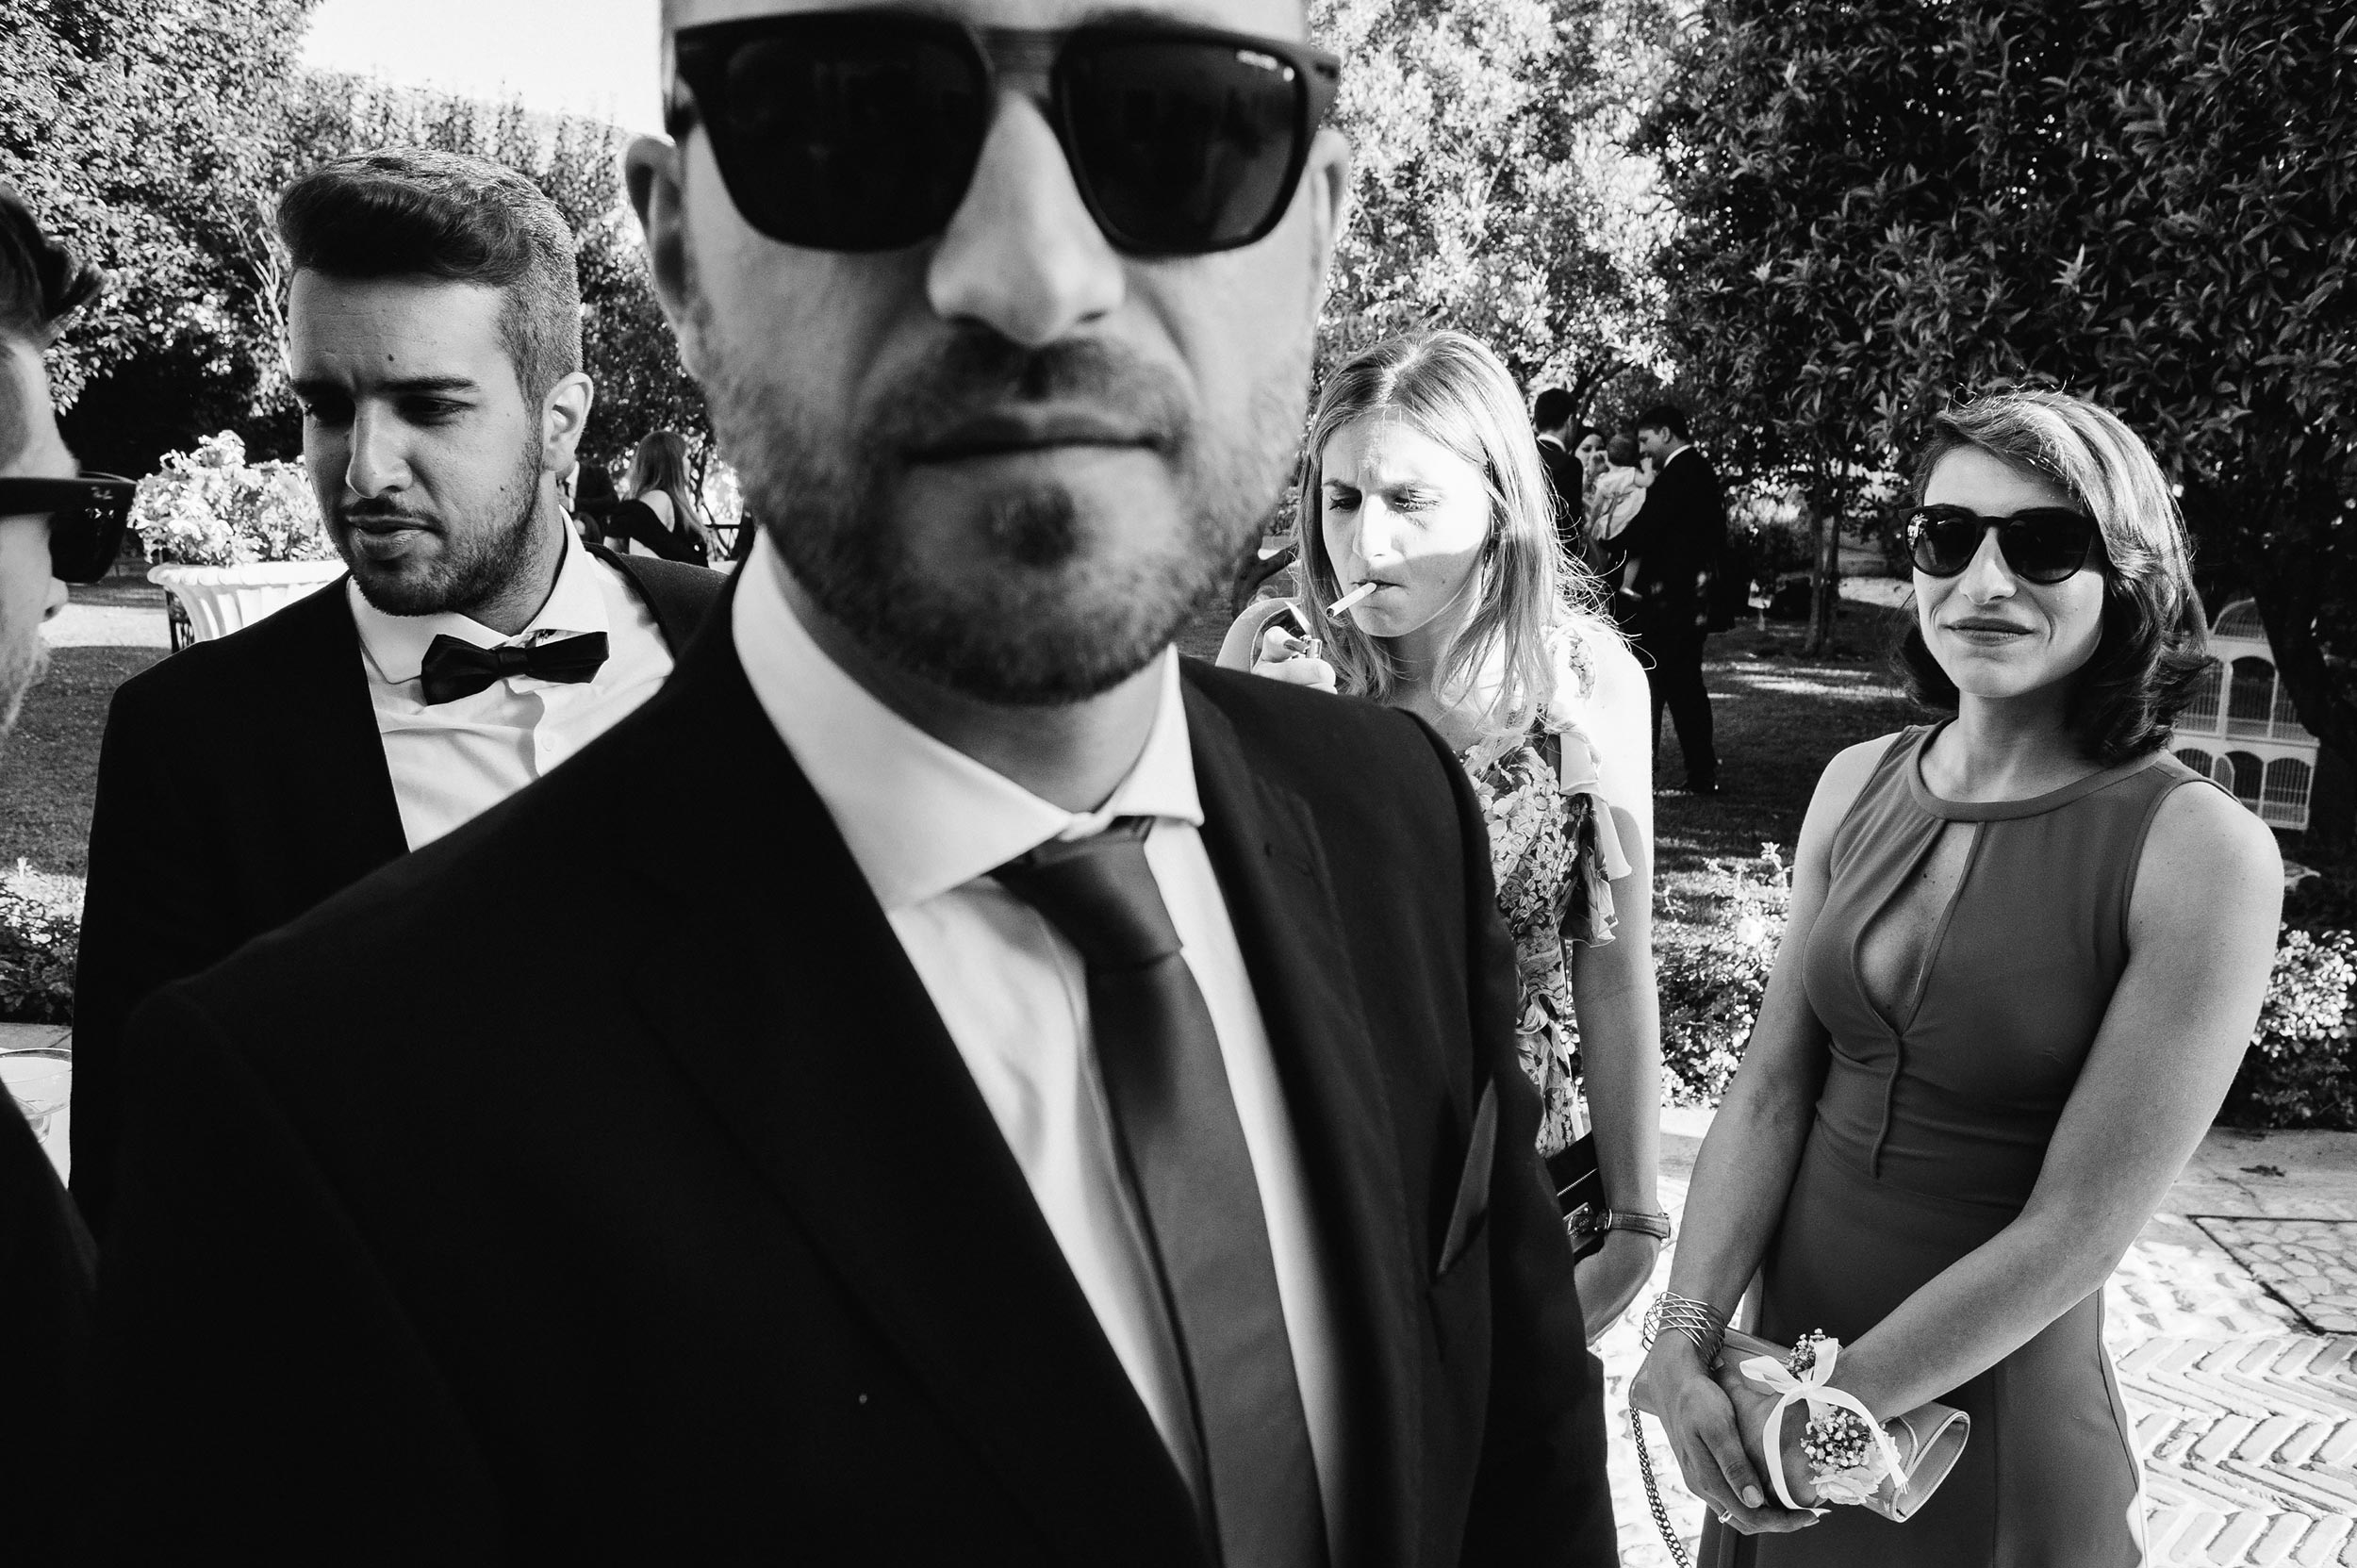 2016-Claudio-Teresa-Naples-Wedding-Photographer-Italy-Alessandro-Avenali-72.jpg